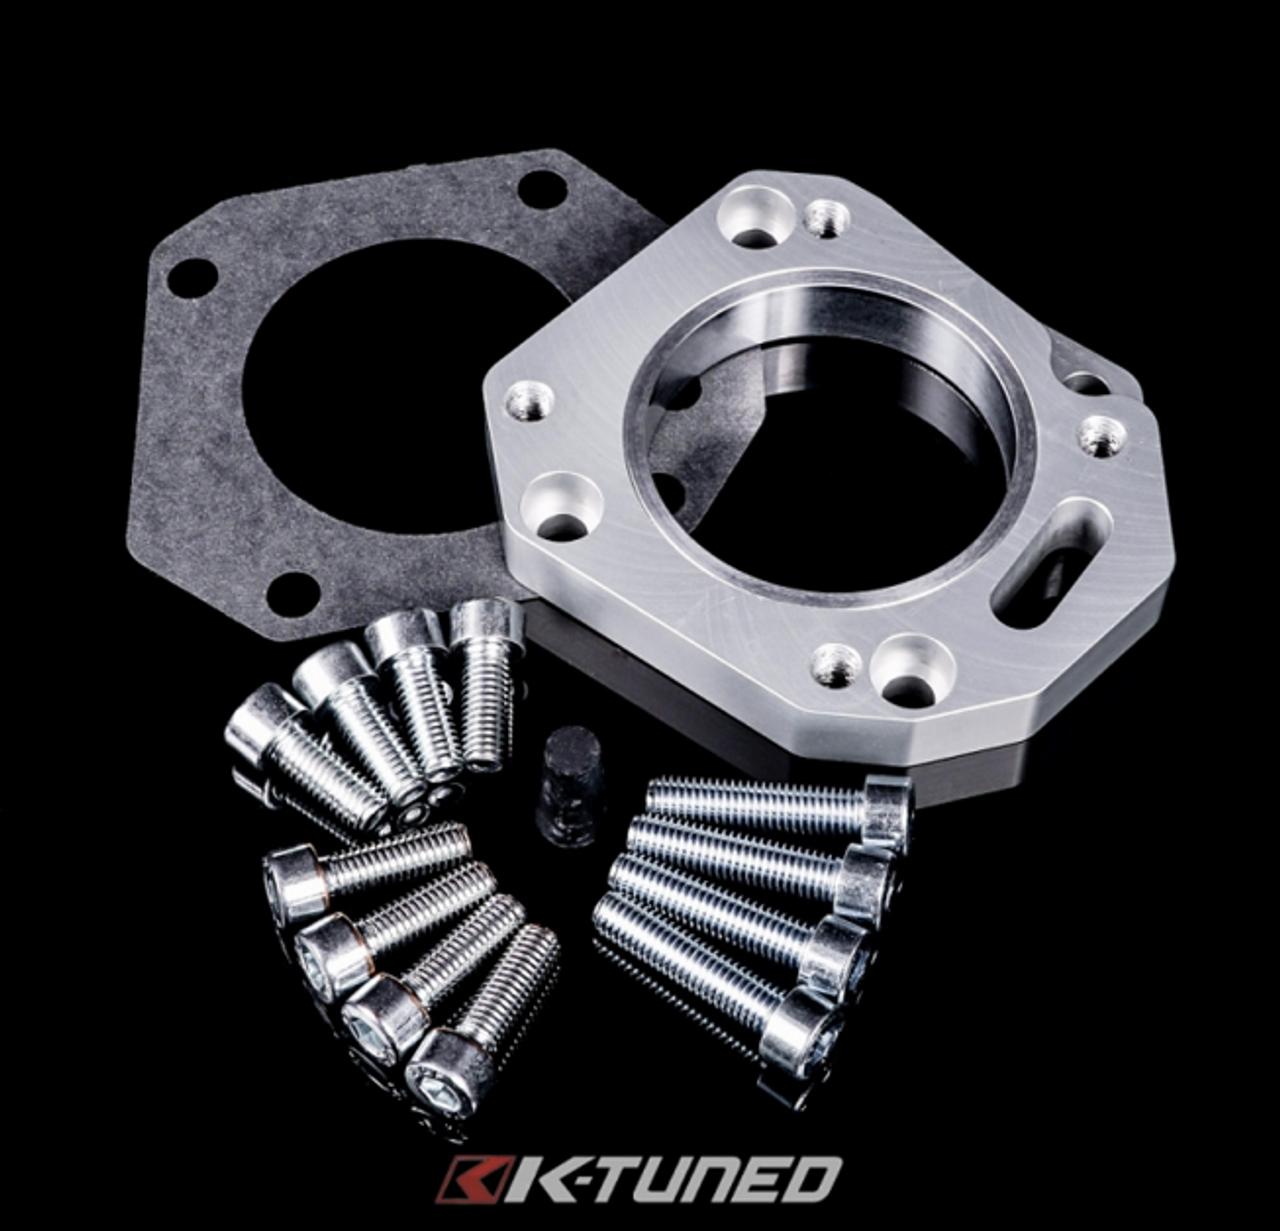 K-MOTOR K SERIES K20 K24 THROTTLE BODY THERMAL GASKET ACURA RSX EP3 HONDA CIVIC